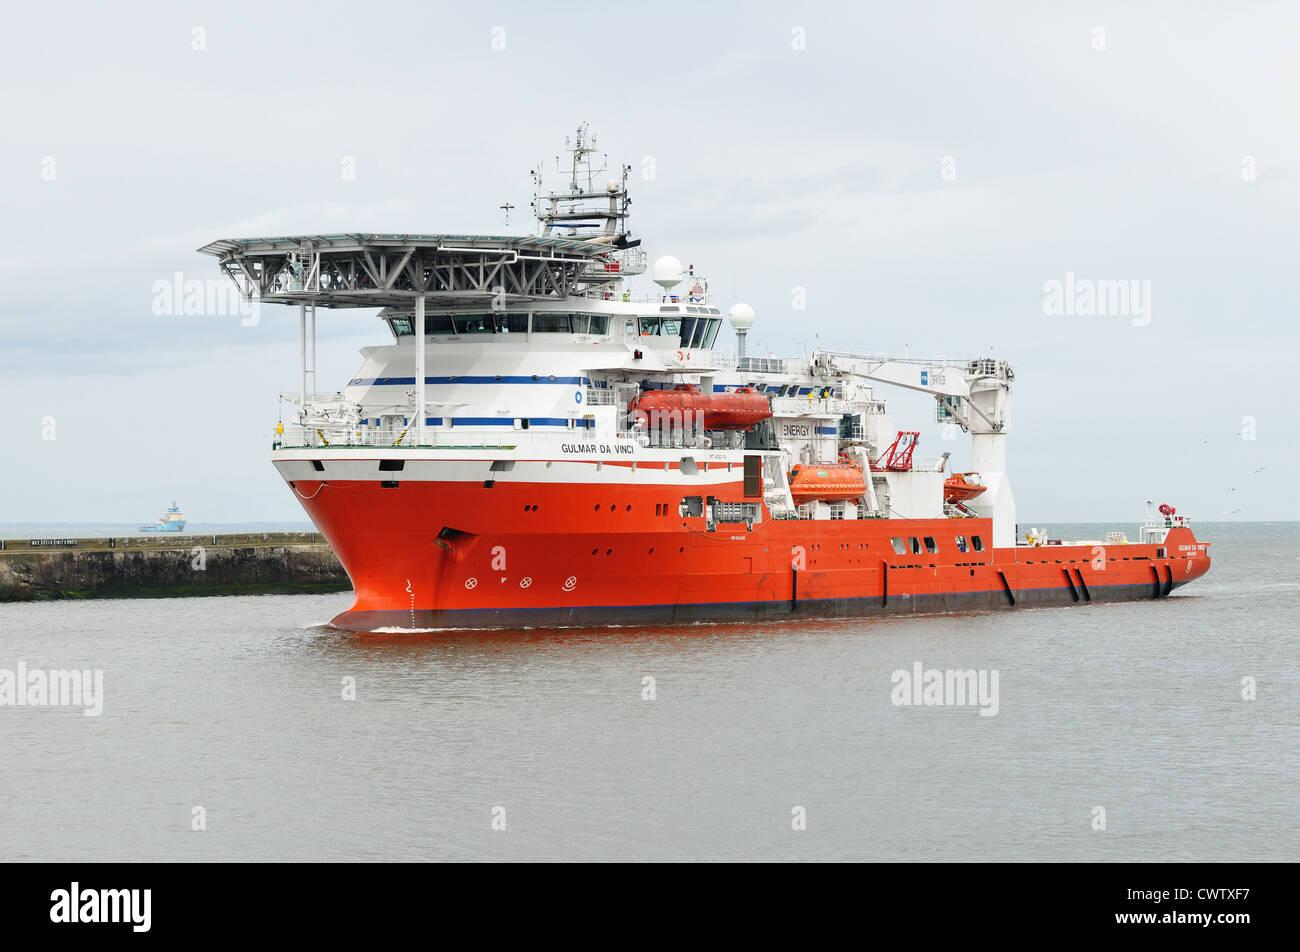 The Gulmar Da Vinci, diving support vessel, entering Aberdeen harbour 2012 Stock Photo